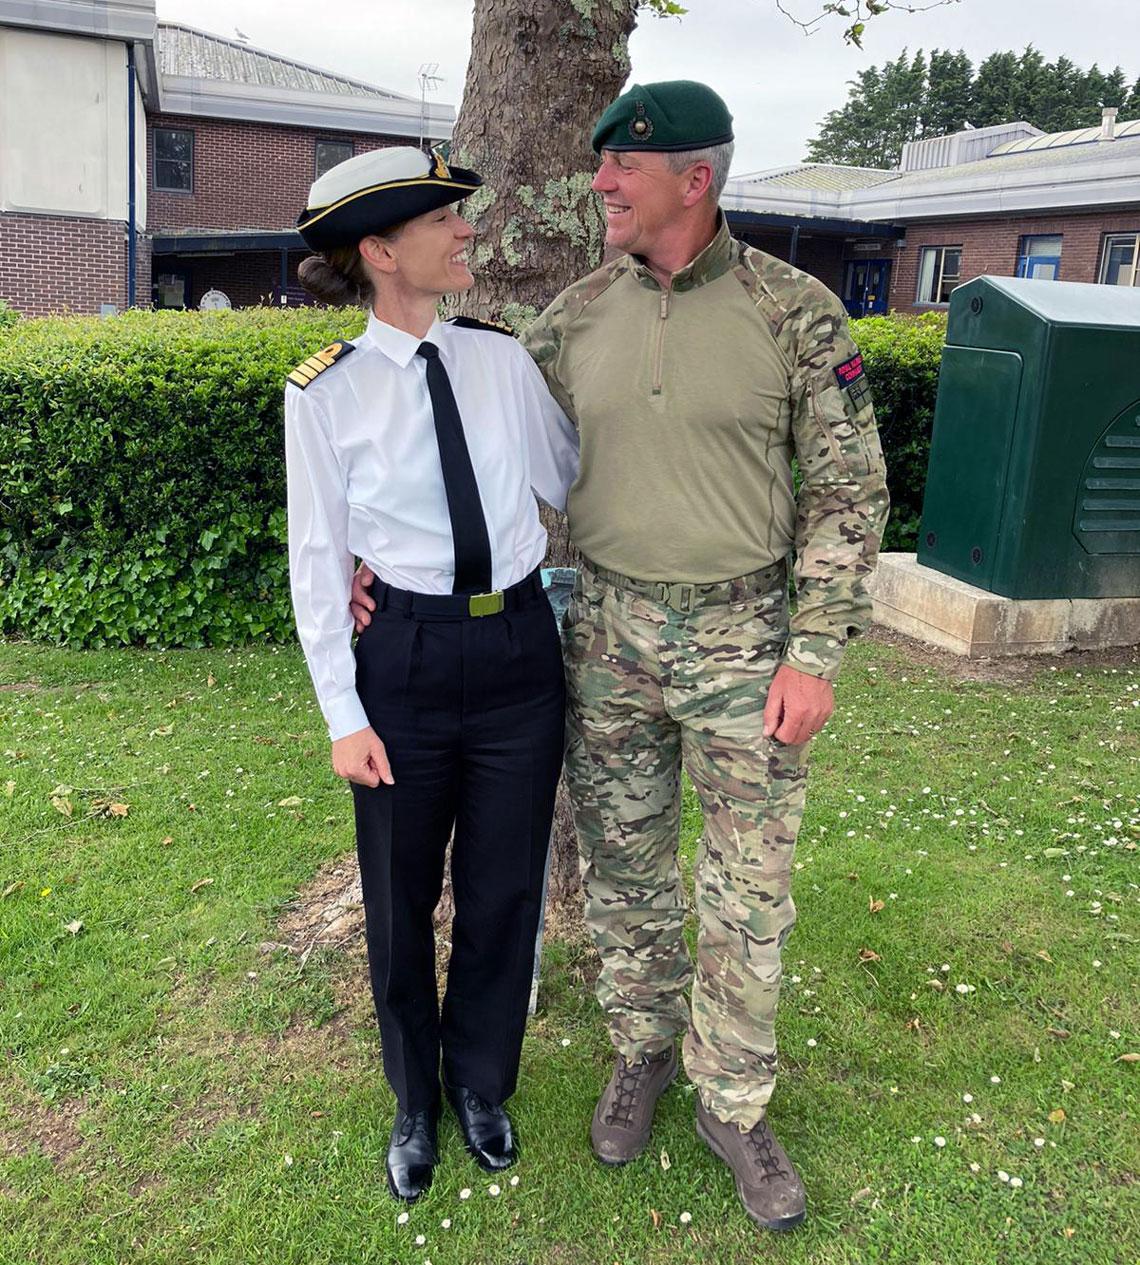 Capt Suzi Nielsen with her husband Major Erik Nielsen